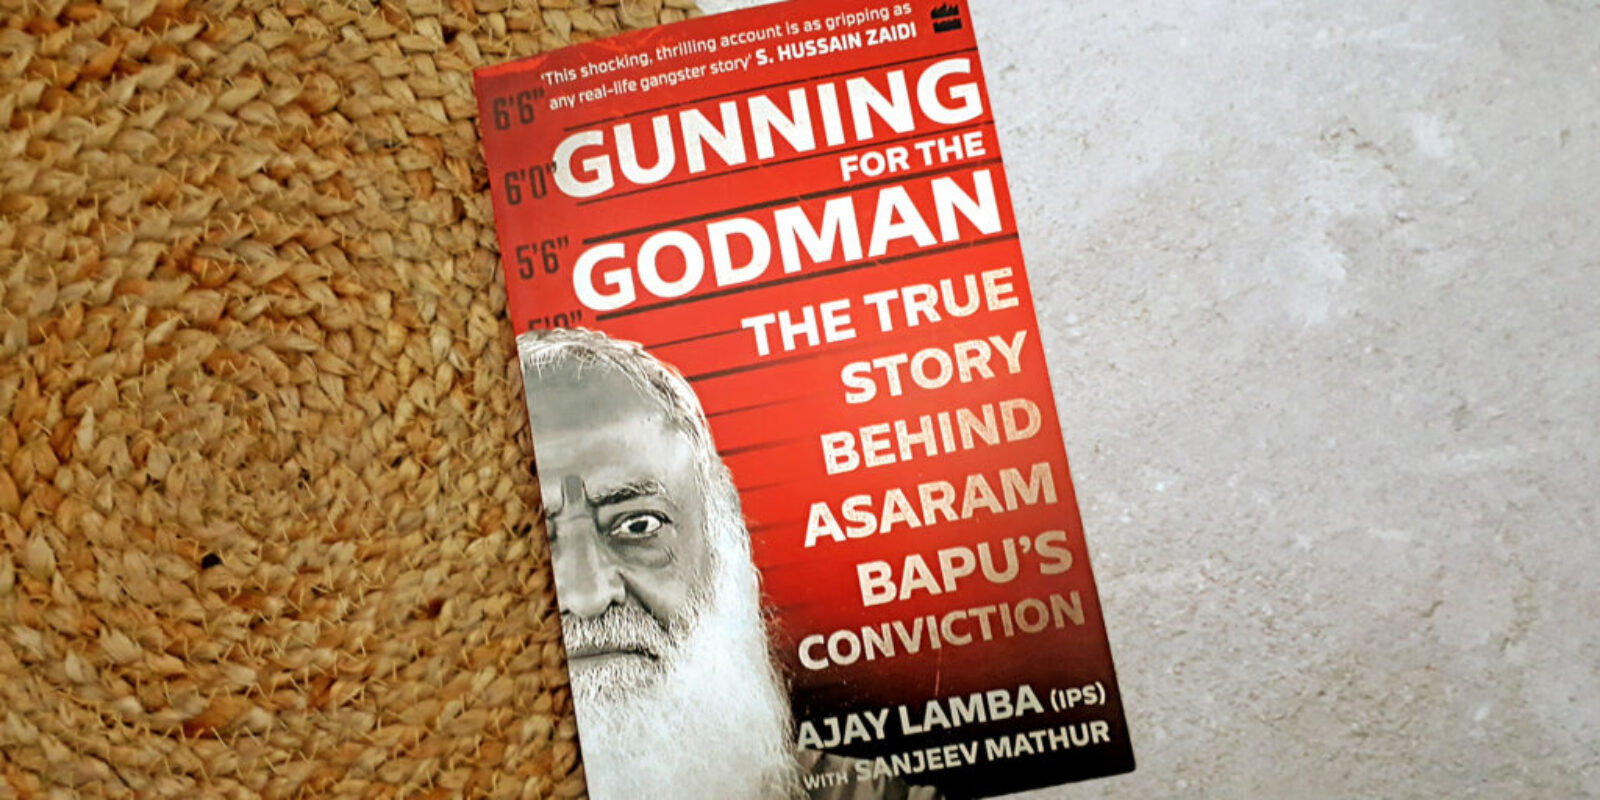 Gunning-for-the-Godman-Asaram-Bapu-Header